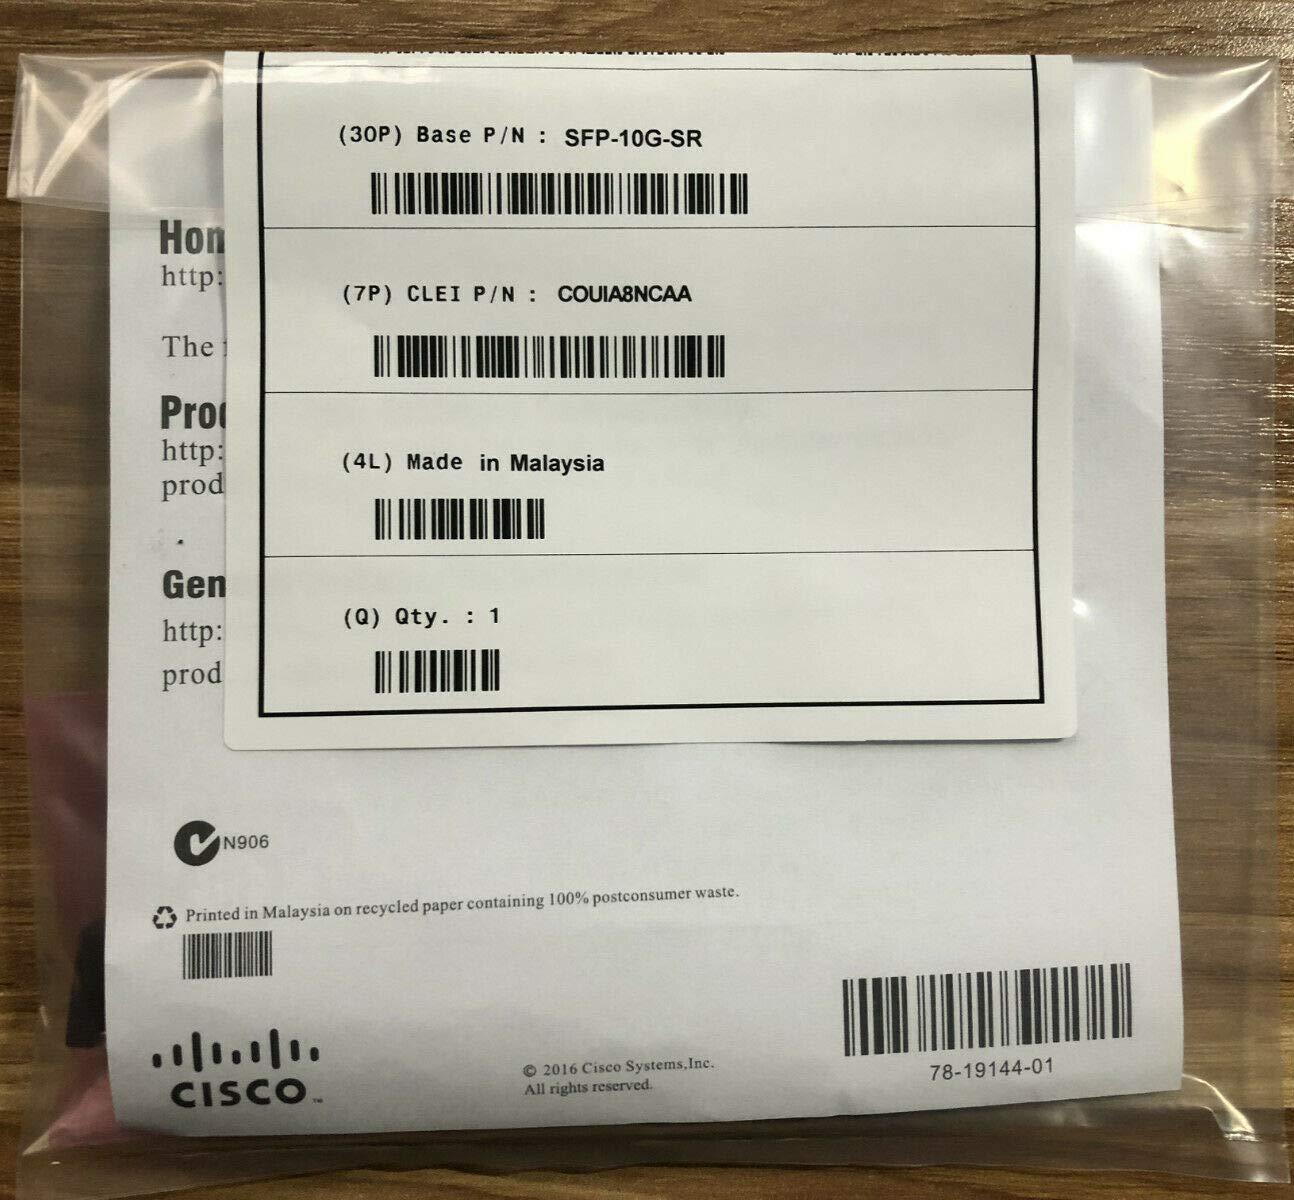 10GBASE-SR SFP Module **Cisco Wholesale**, SFP-10G-SR (**Cisco Wholesale** WS 10GBASE-SR SFP Module) by Cisco